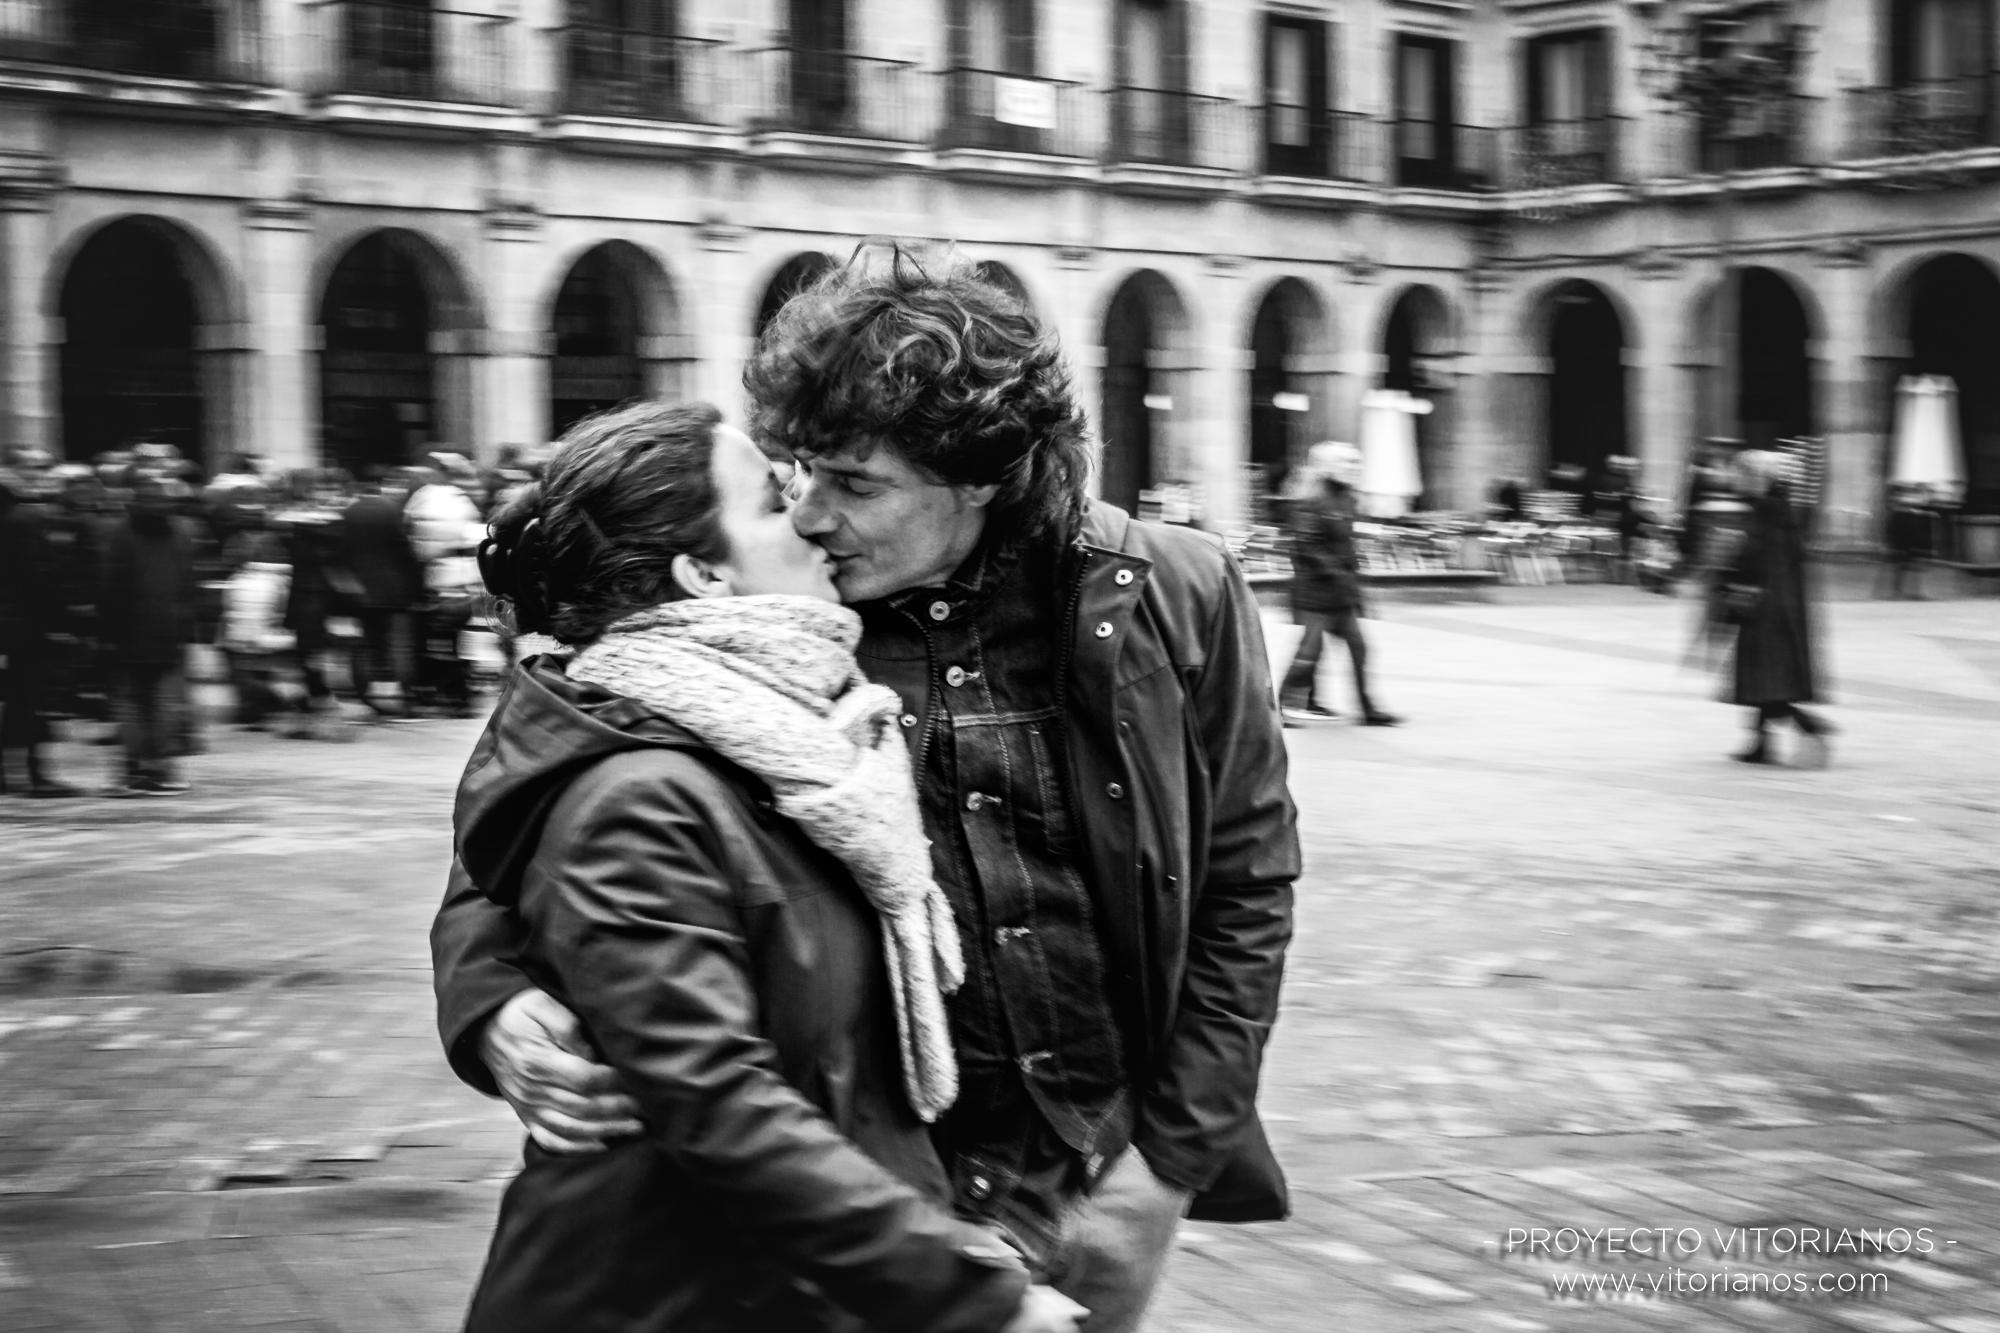 Vitorianos besándose - Foto: Bea Cañas